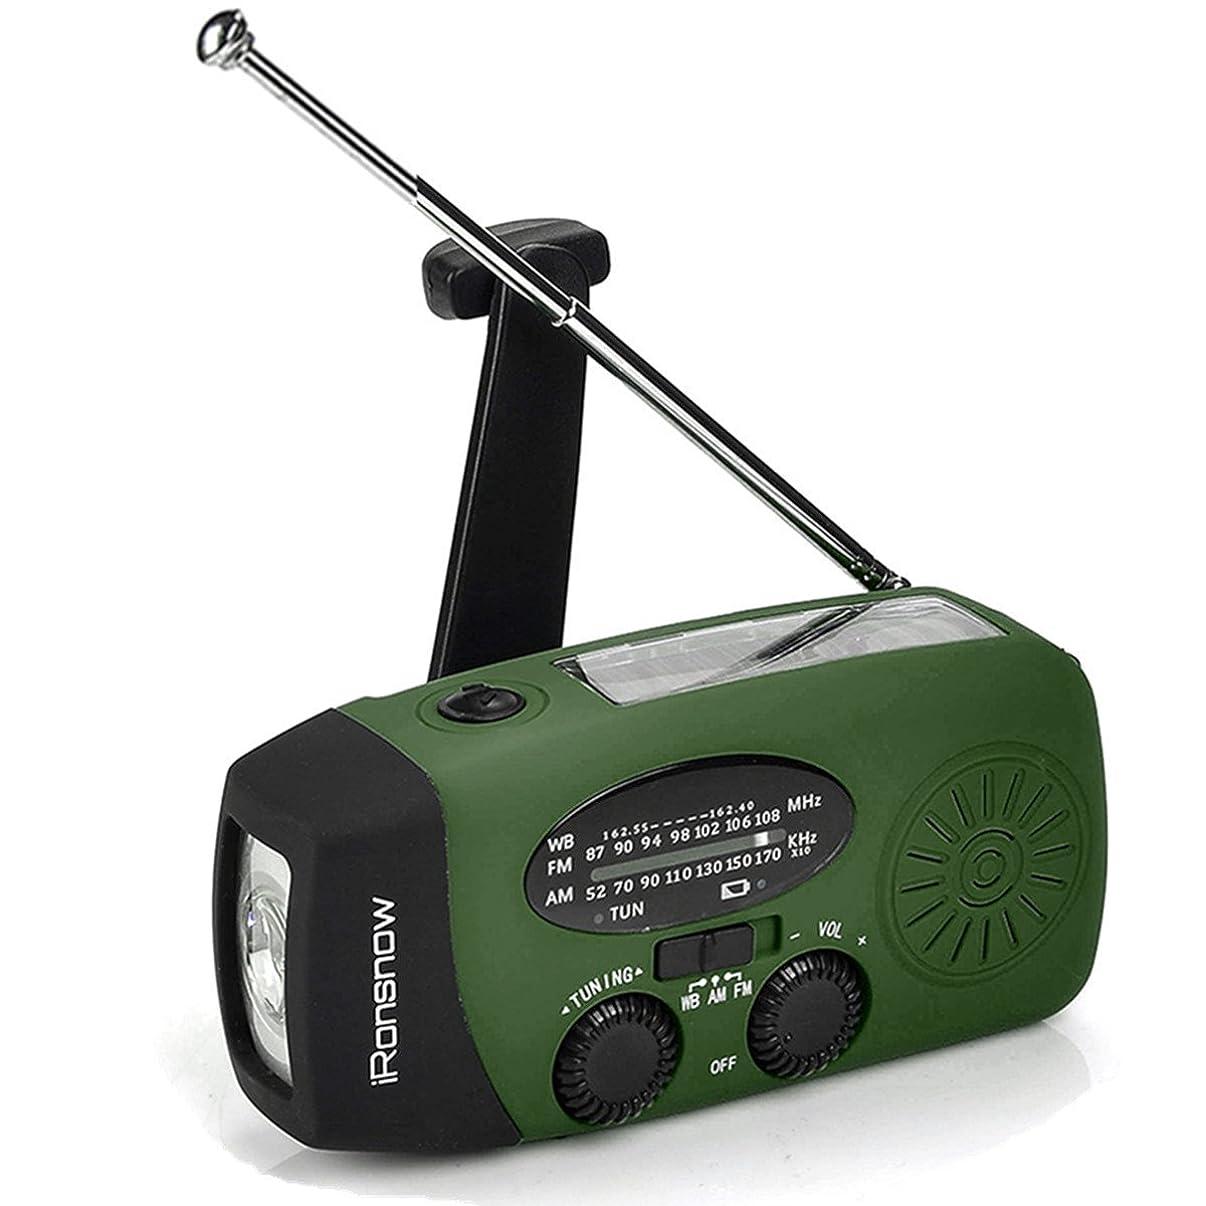 iRonsnow Upgraded Version IS-088U+ Dynamo Solar Hand Crank Self Powered AM/FM/NOAA Weather Radio with LED Flashlight and 1000mAh Emergency Power Bank (Green)